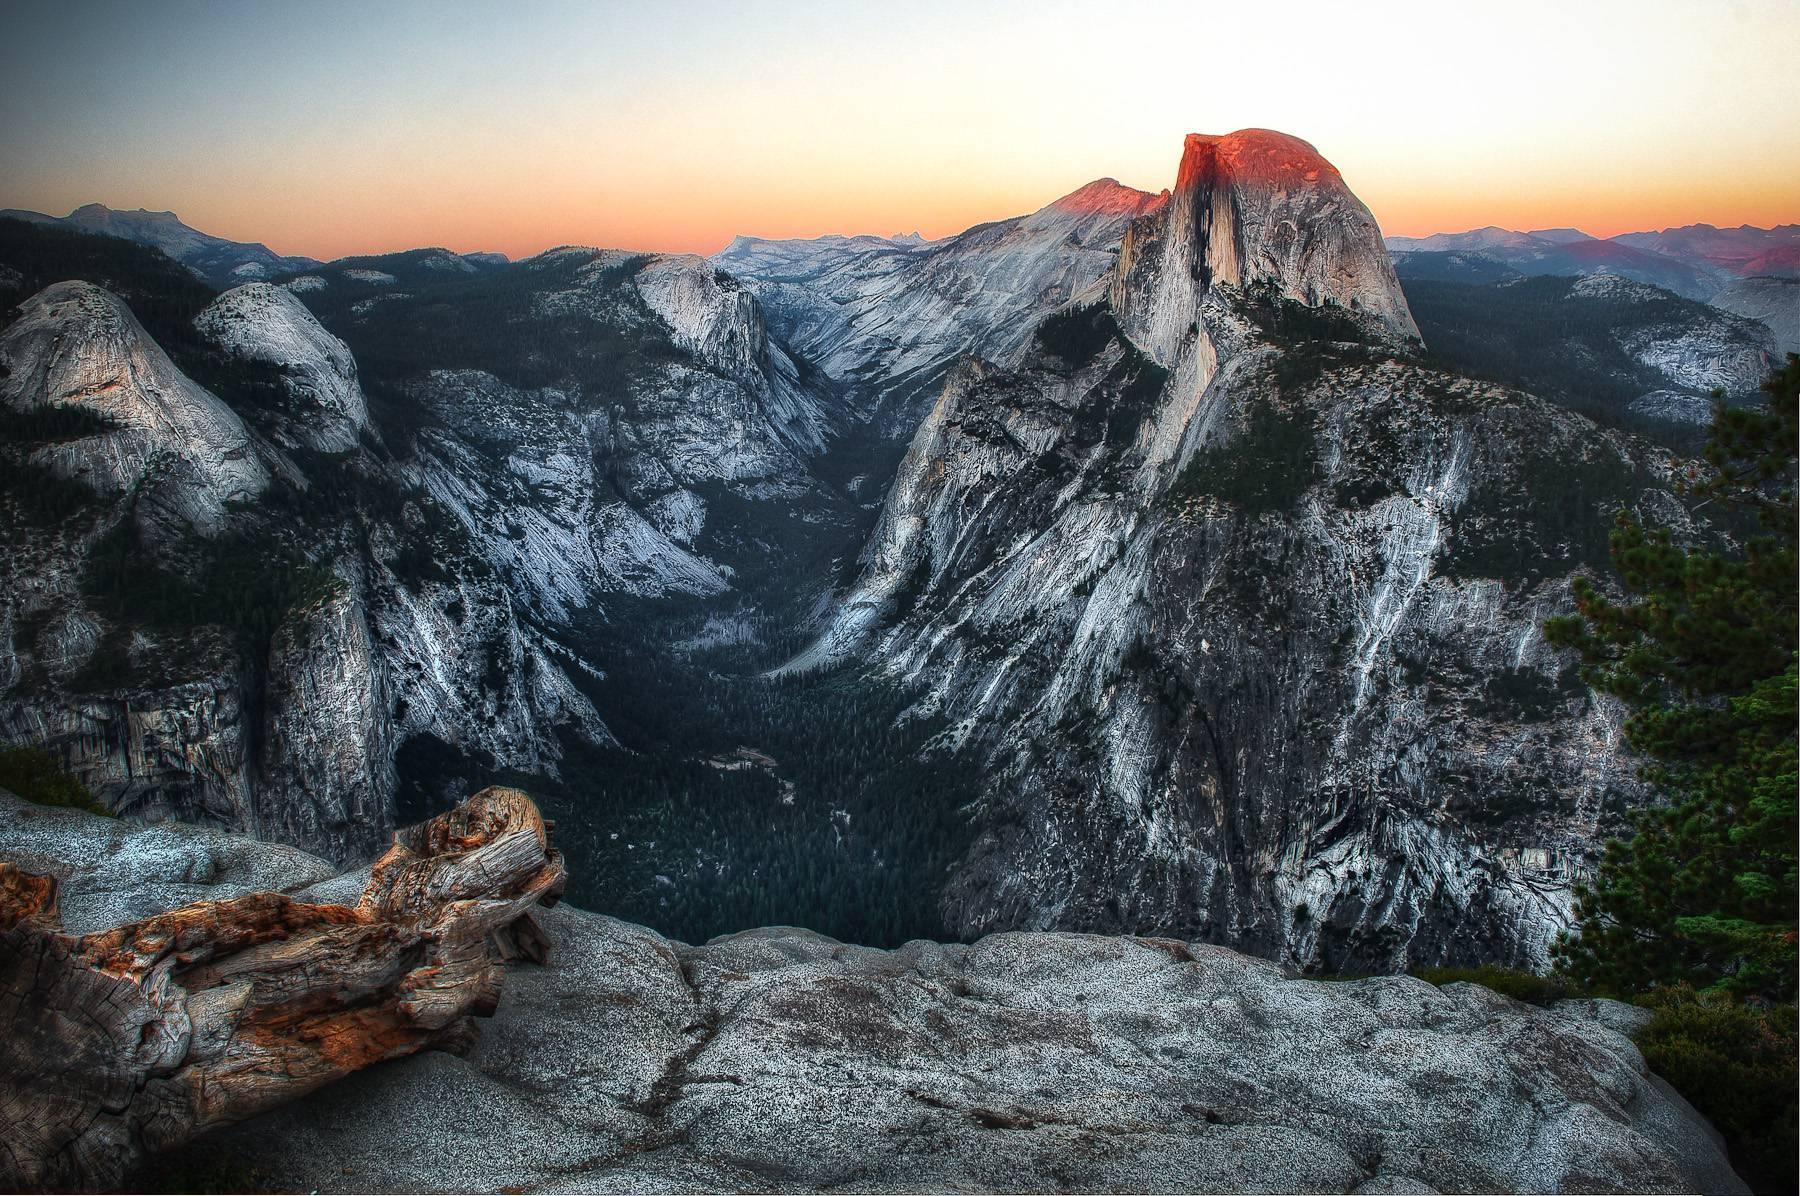 Iphone wallpaper os x yosemite - Topics Apple Os X Yosemite Public Beta